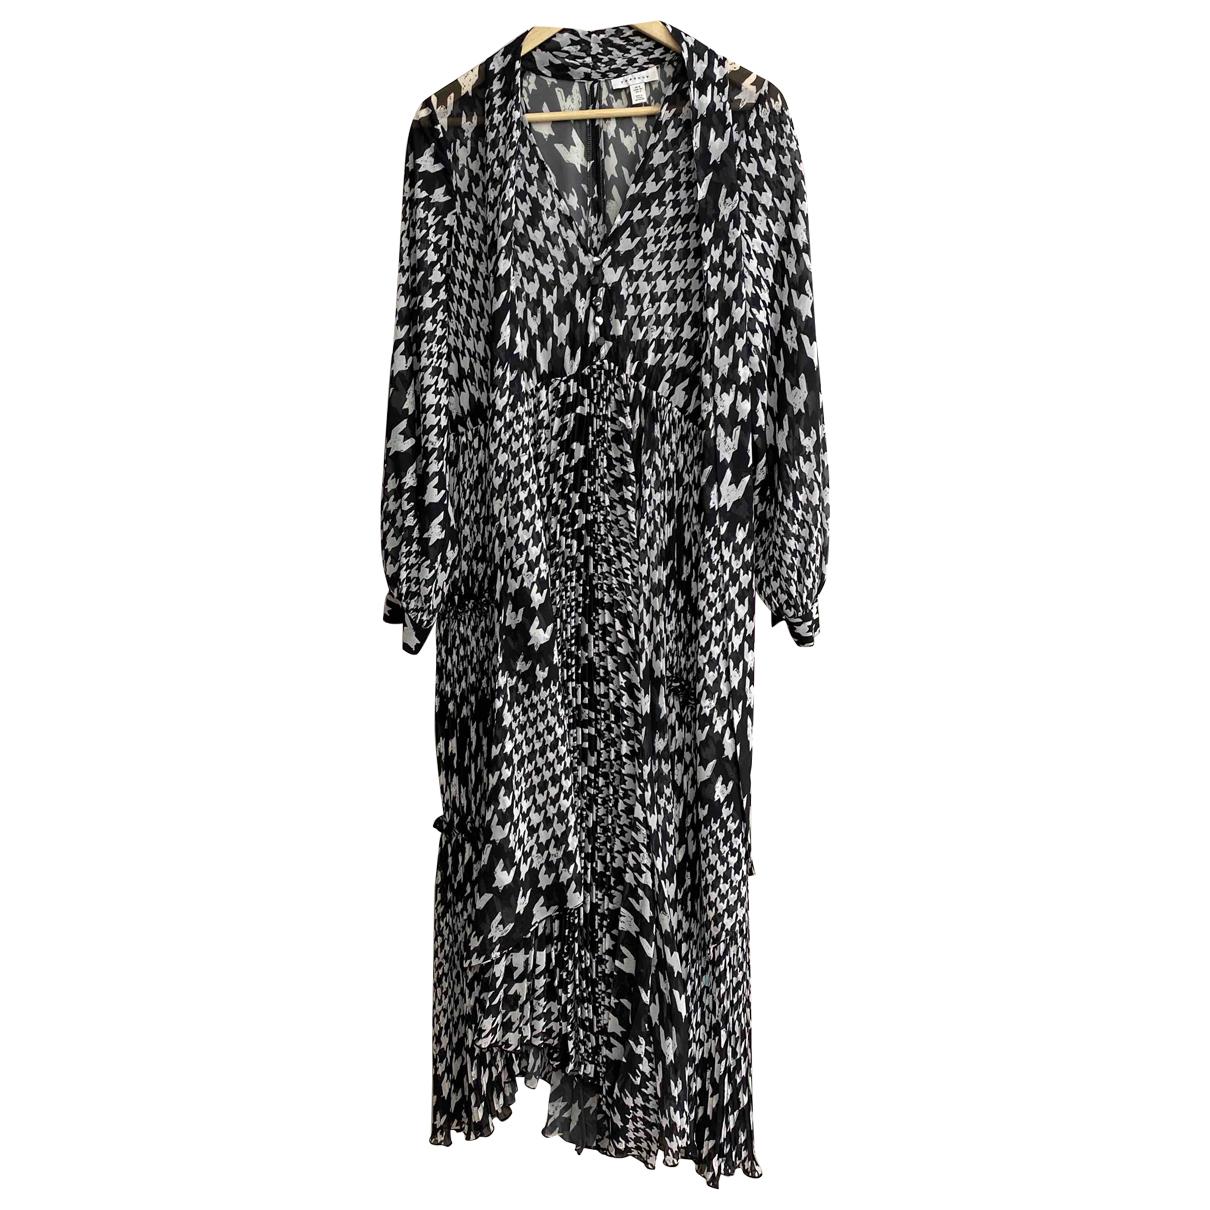 Tophop \N Kleid in  Schwarz Synthetik